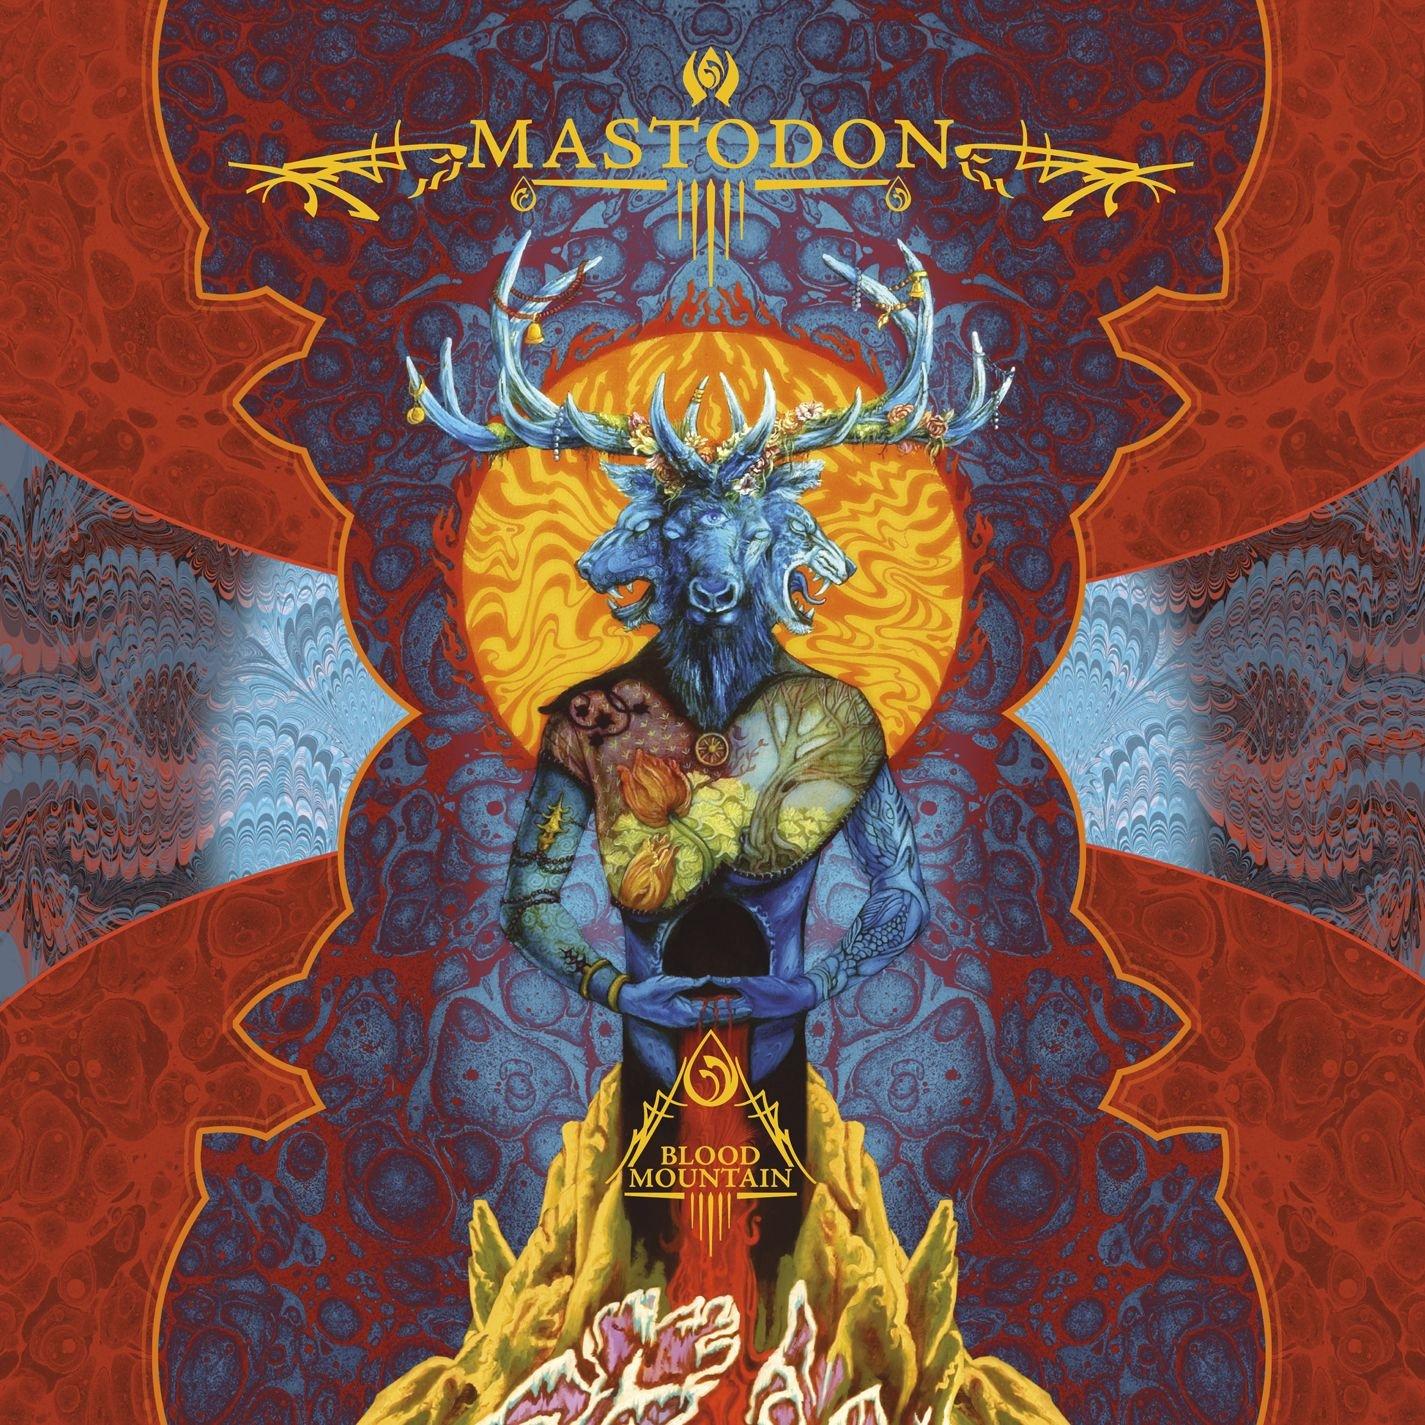 Vinilo : Mastodon - Blood Mountain (LP Vinyl)